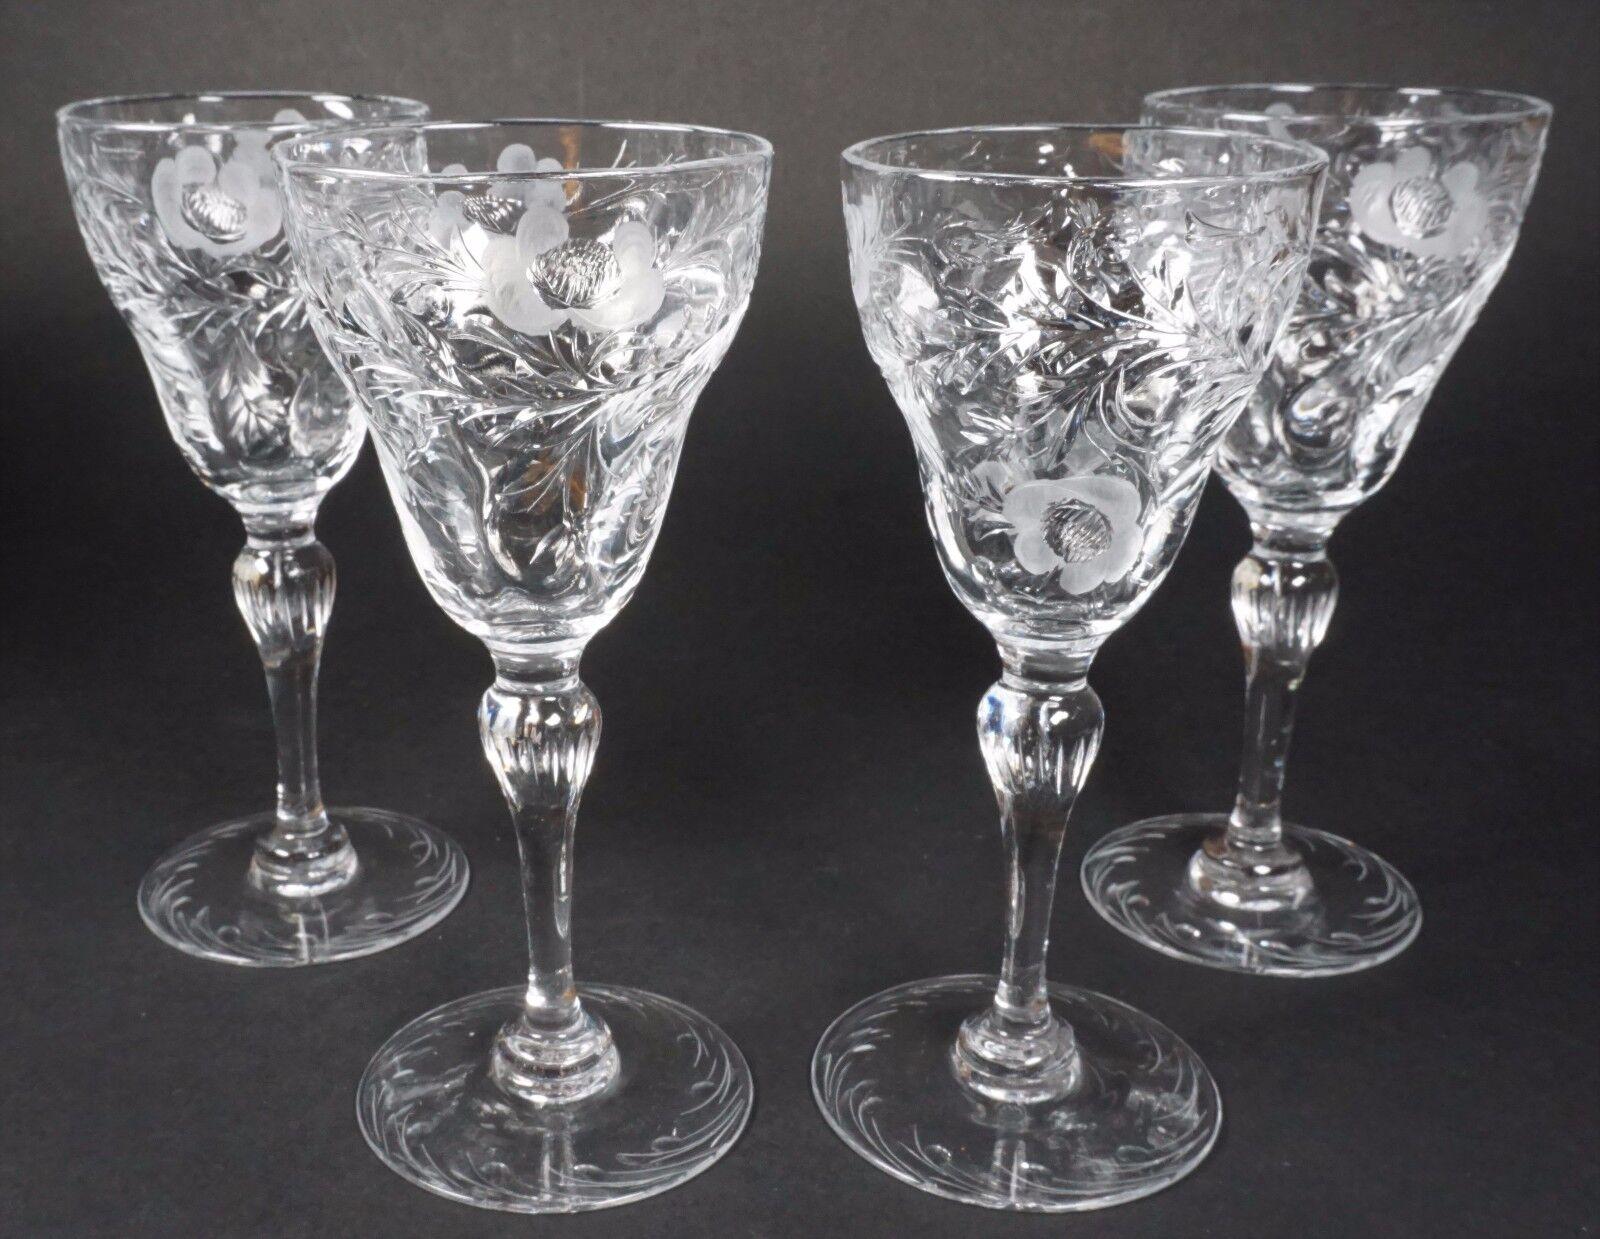 GORGEOUS Thomas Webb Cut Floral Crystal Wine Glasses Stems - Set of 4